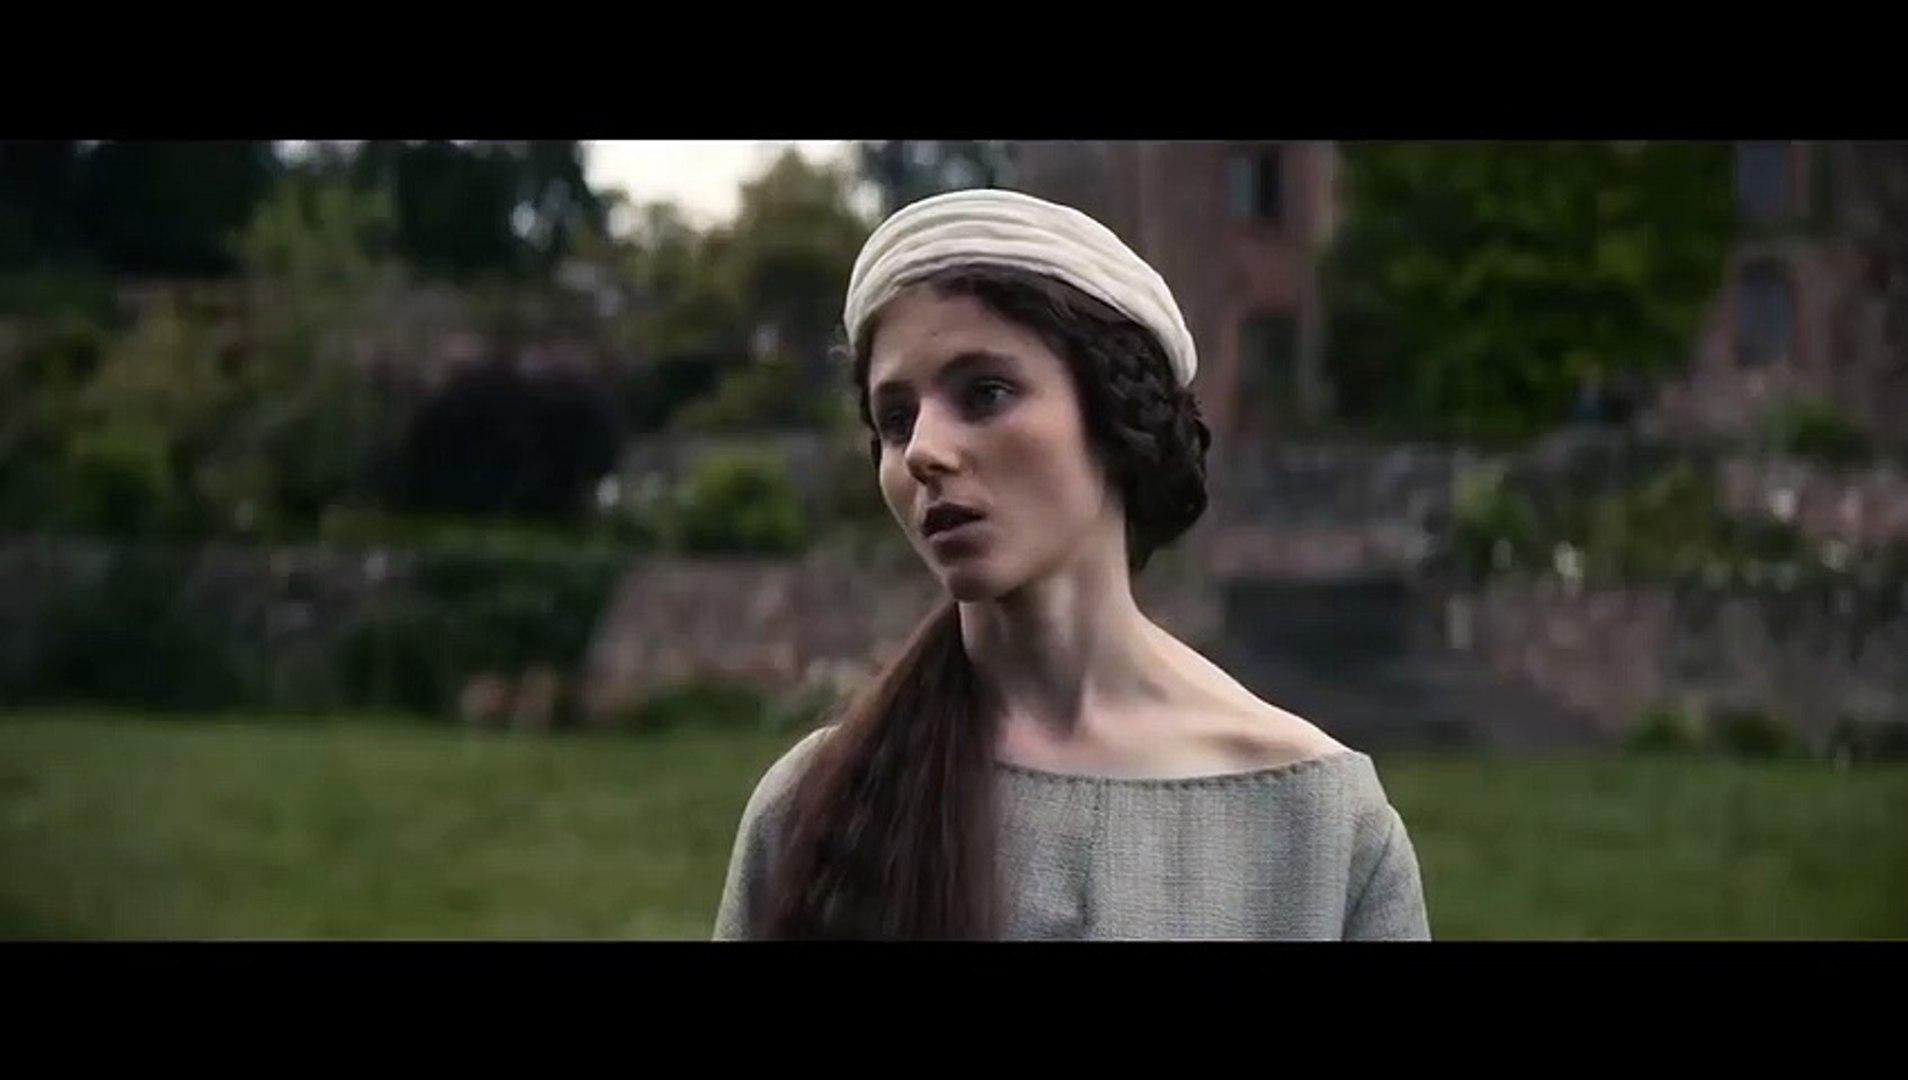 The King Final Trailer (2019) - watch trailer film The King Final 2019